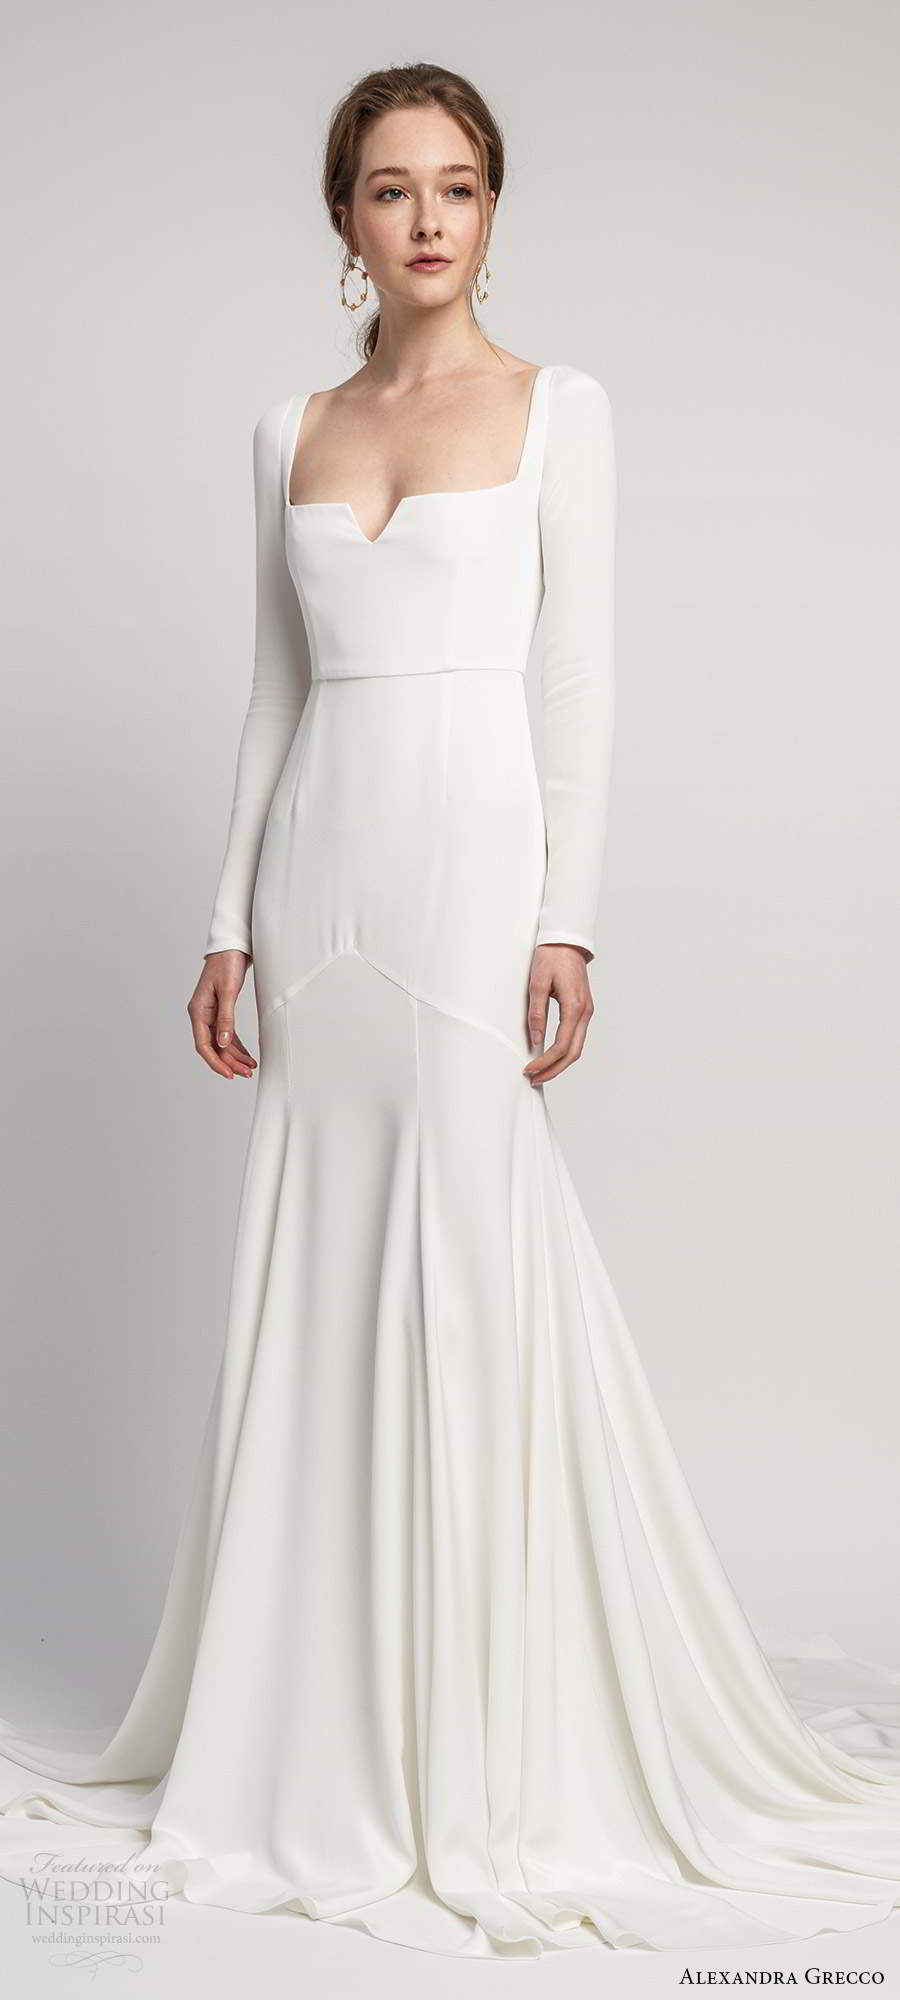 alexandra grecco 2020 bridal long sleeves square neckline minimalist clean fit flare mermaid wedding dress keyhole back chapel train (1) mv